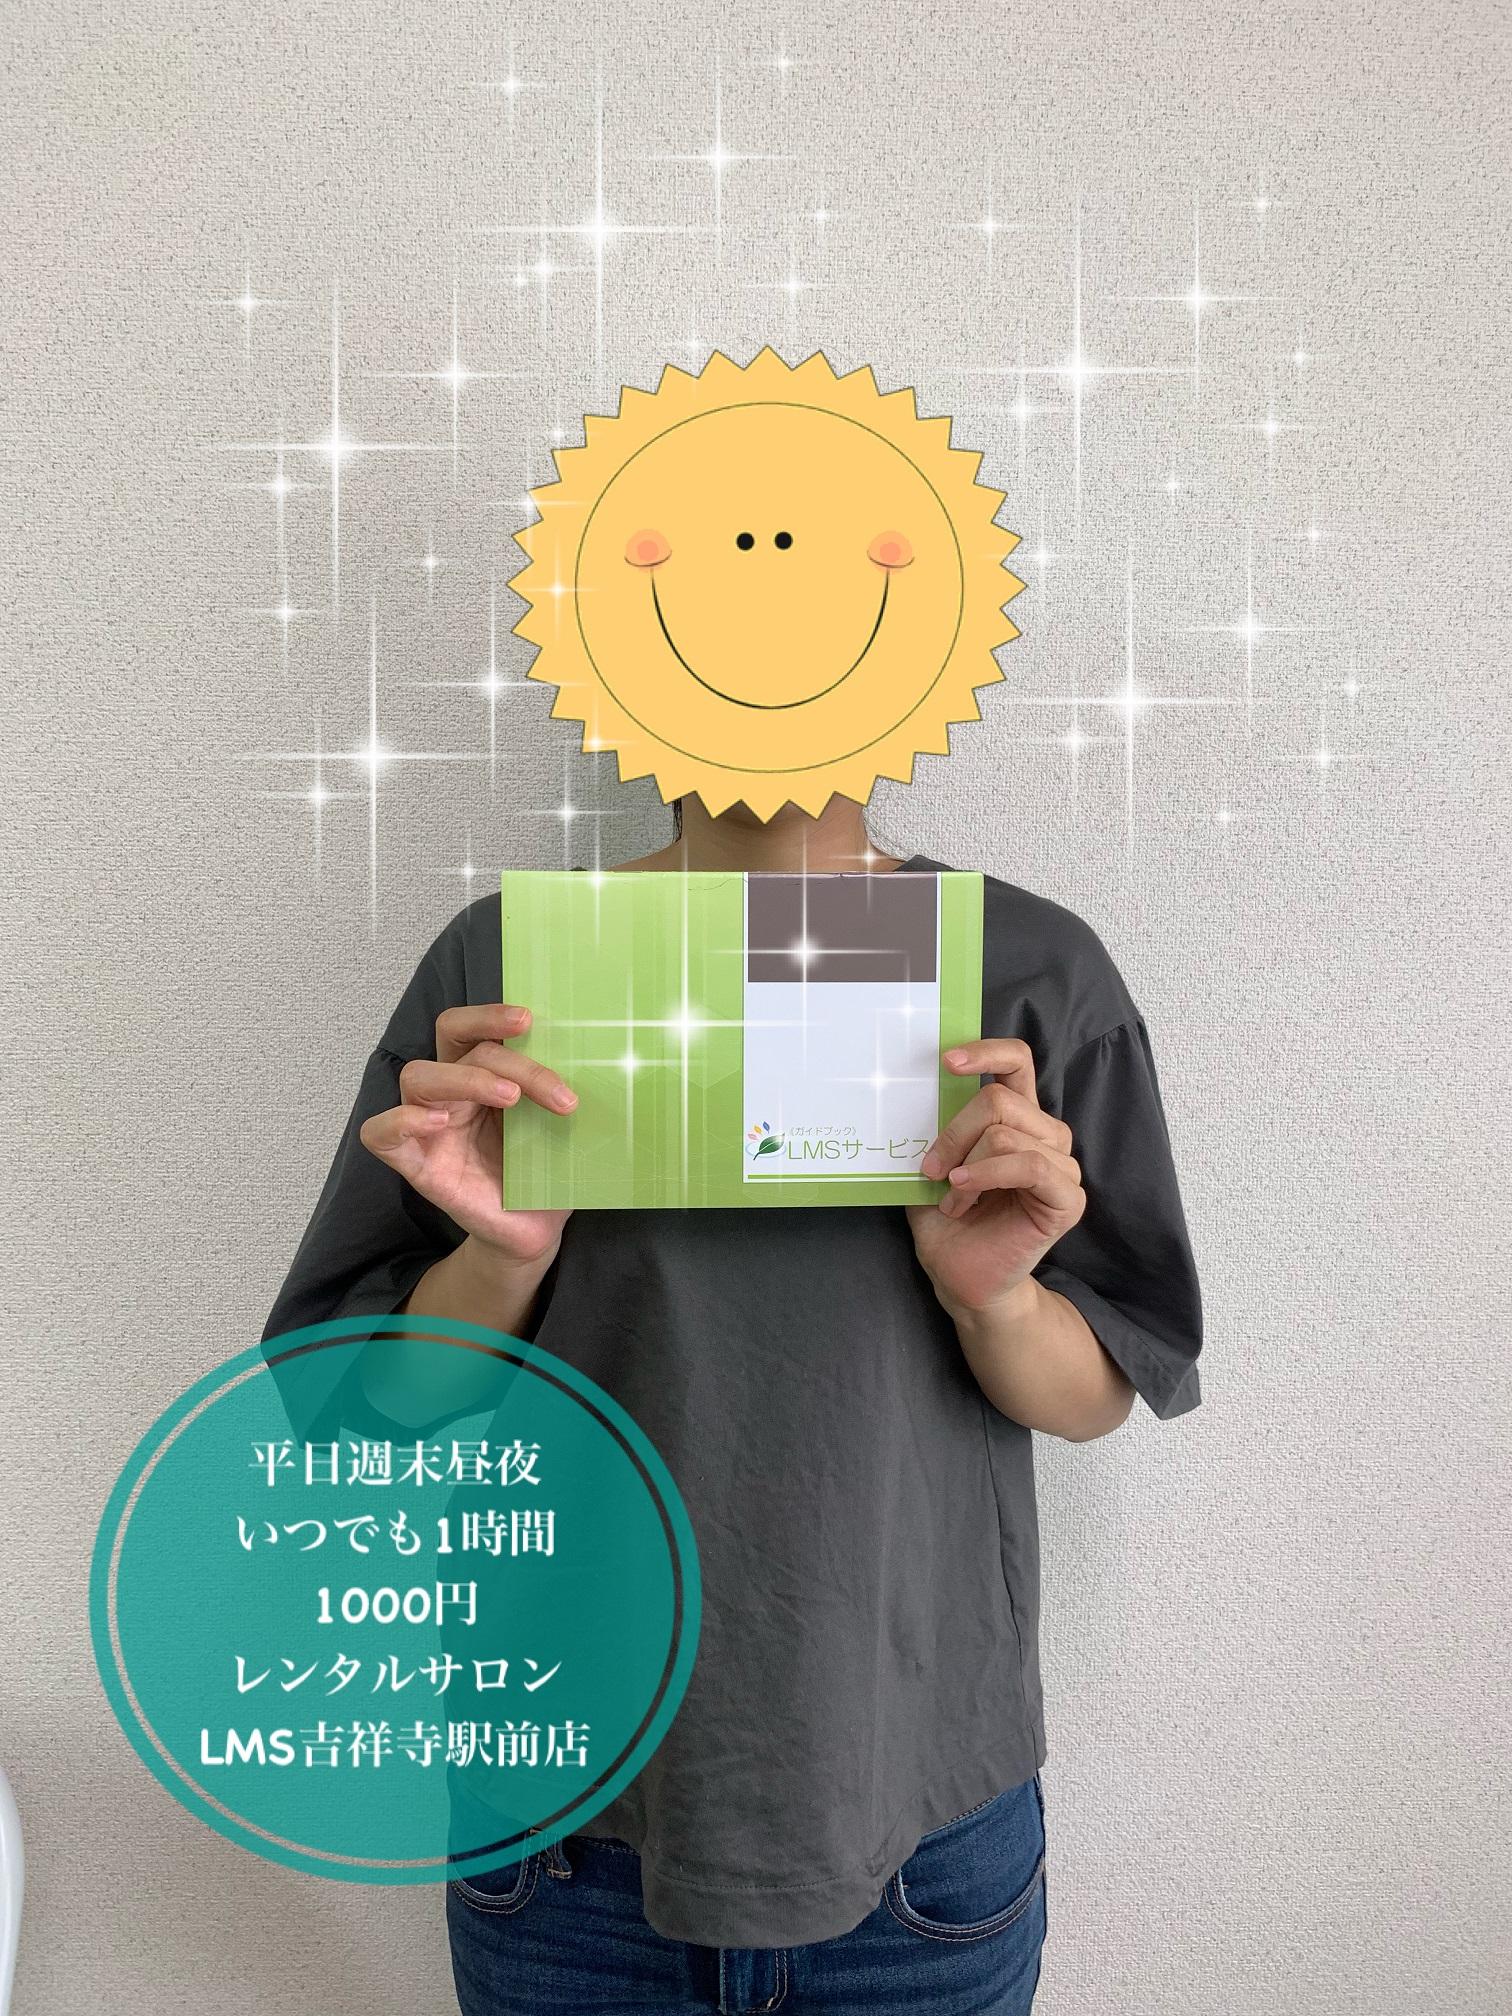 LMSレンタルサロン 吉祥寺駅前店